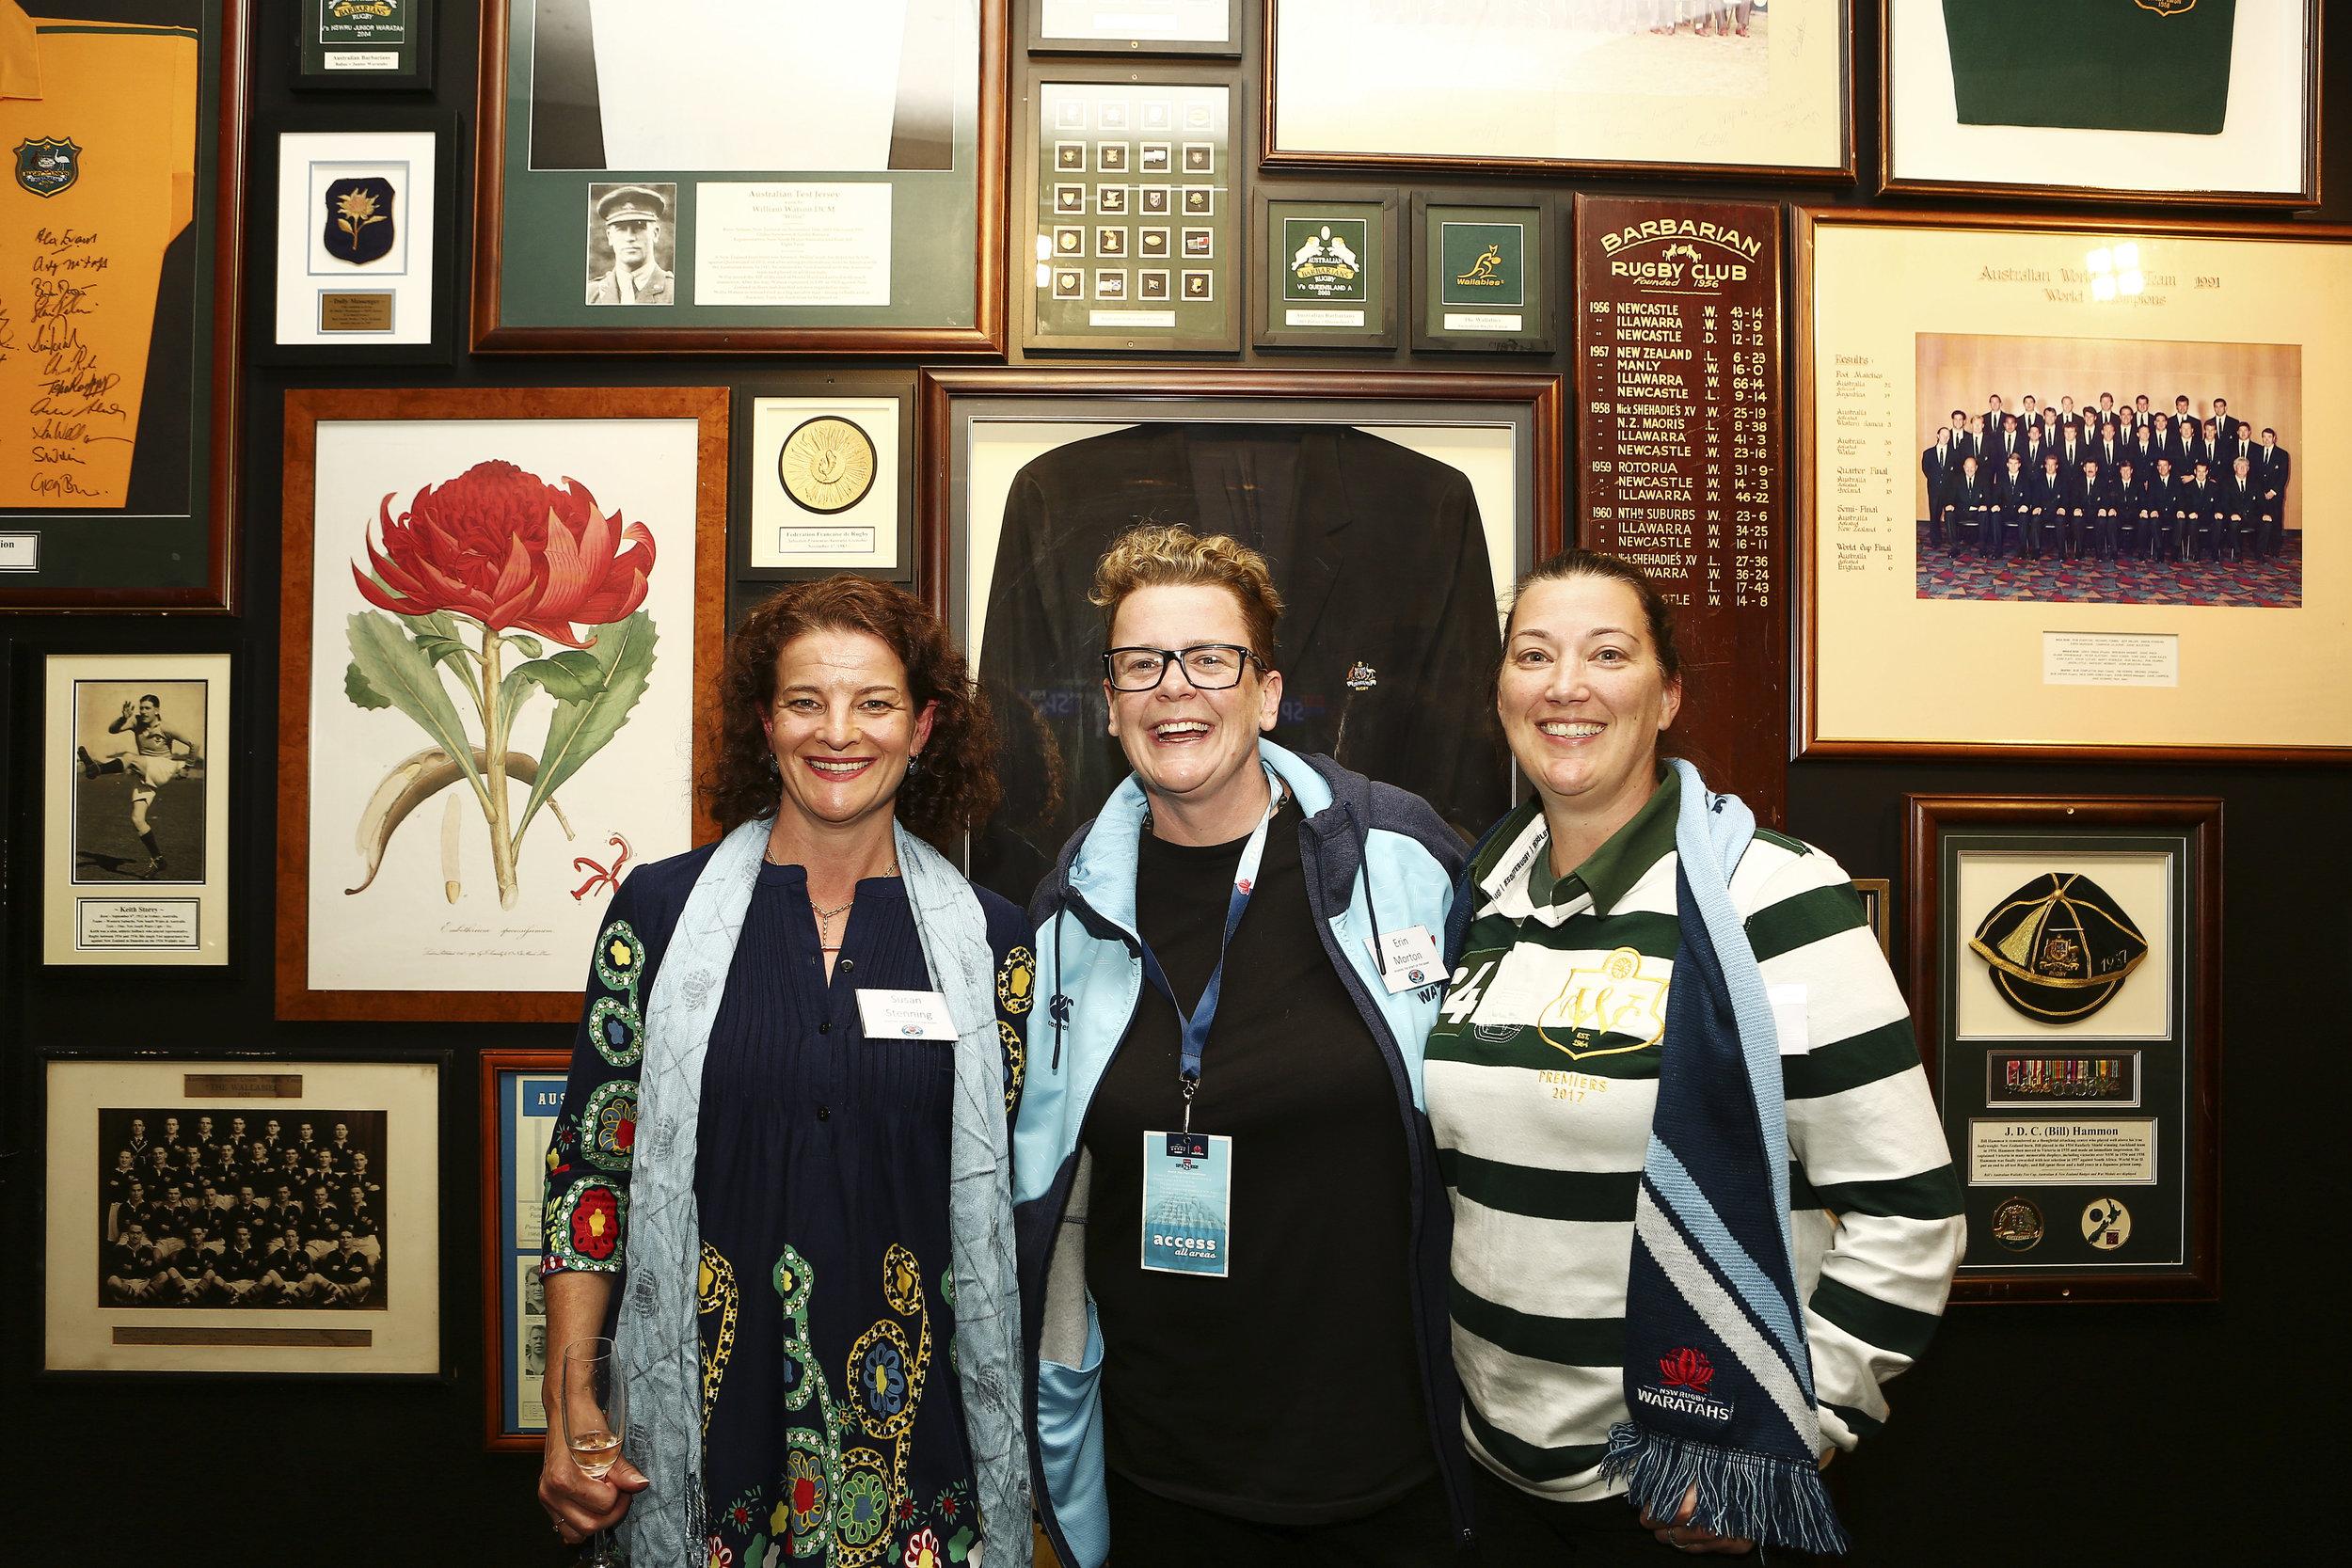 Susan Stenning, Erin Morton and Kirsty Slater 377A5274 © Karen Watson.jpg